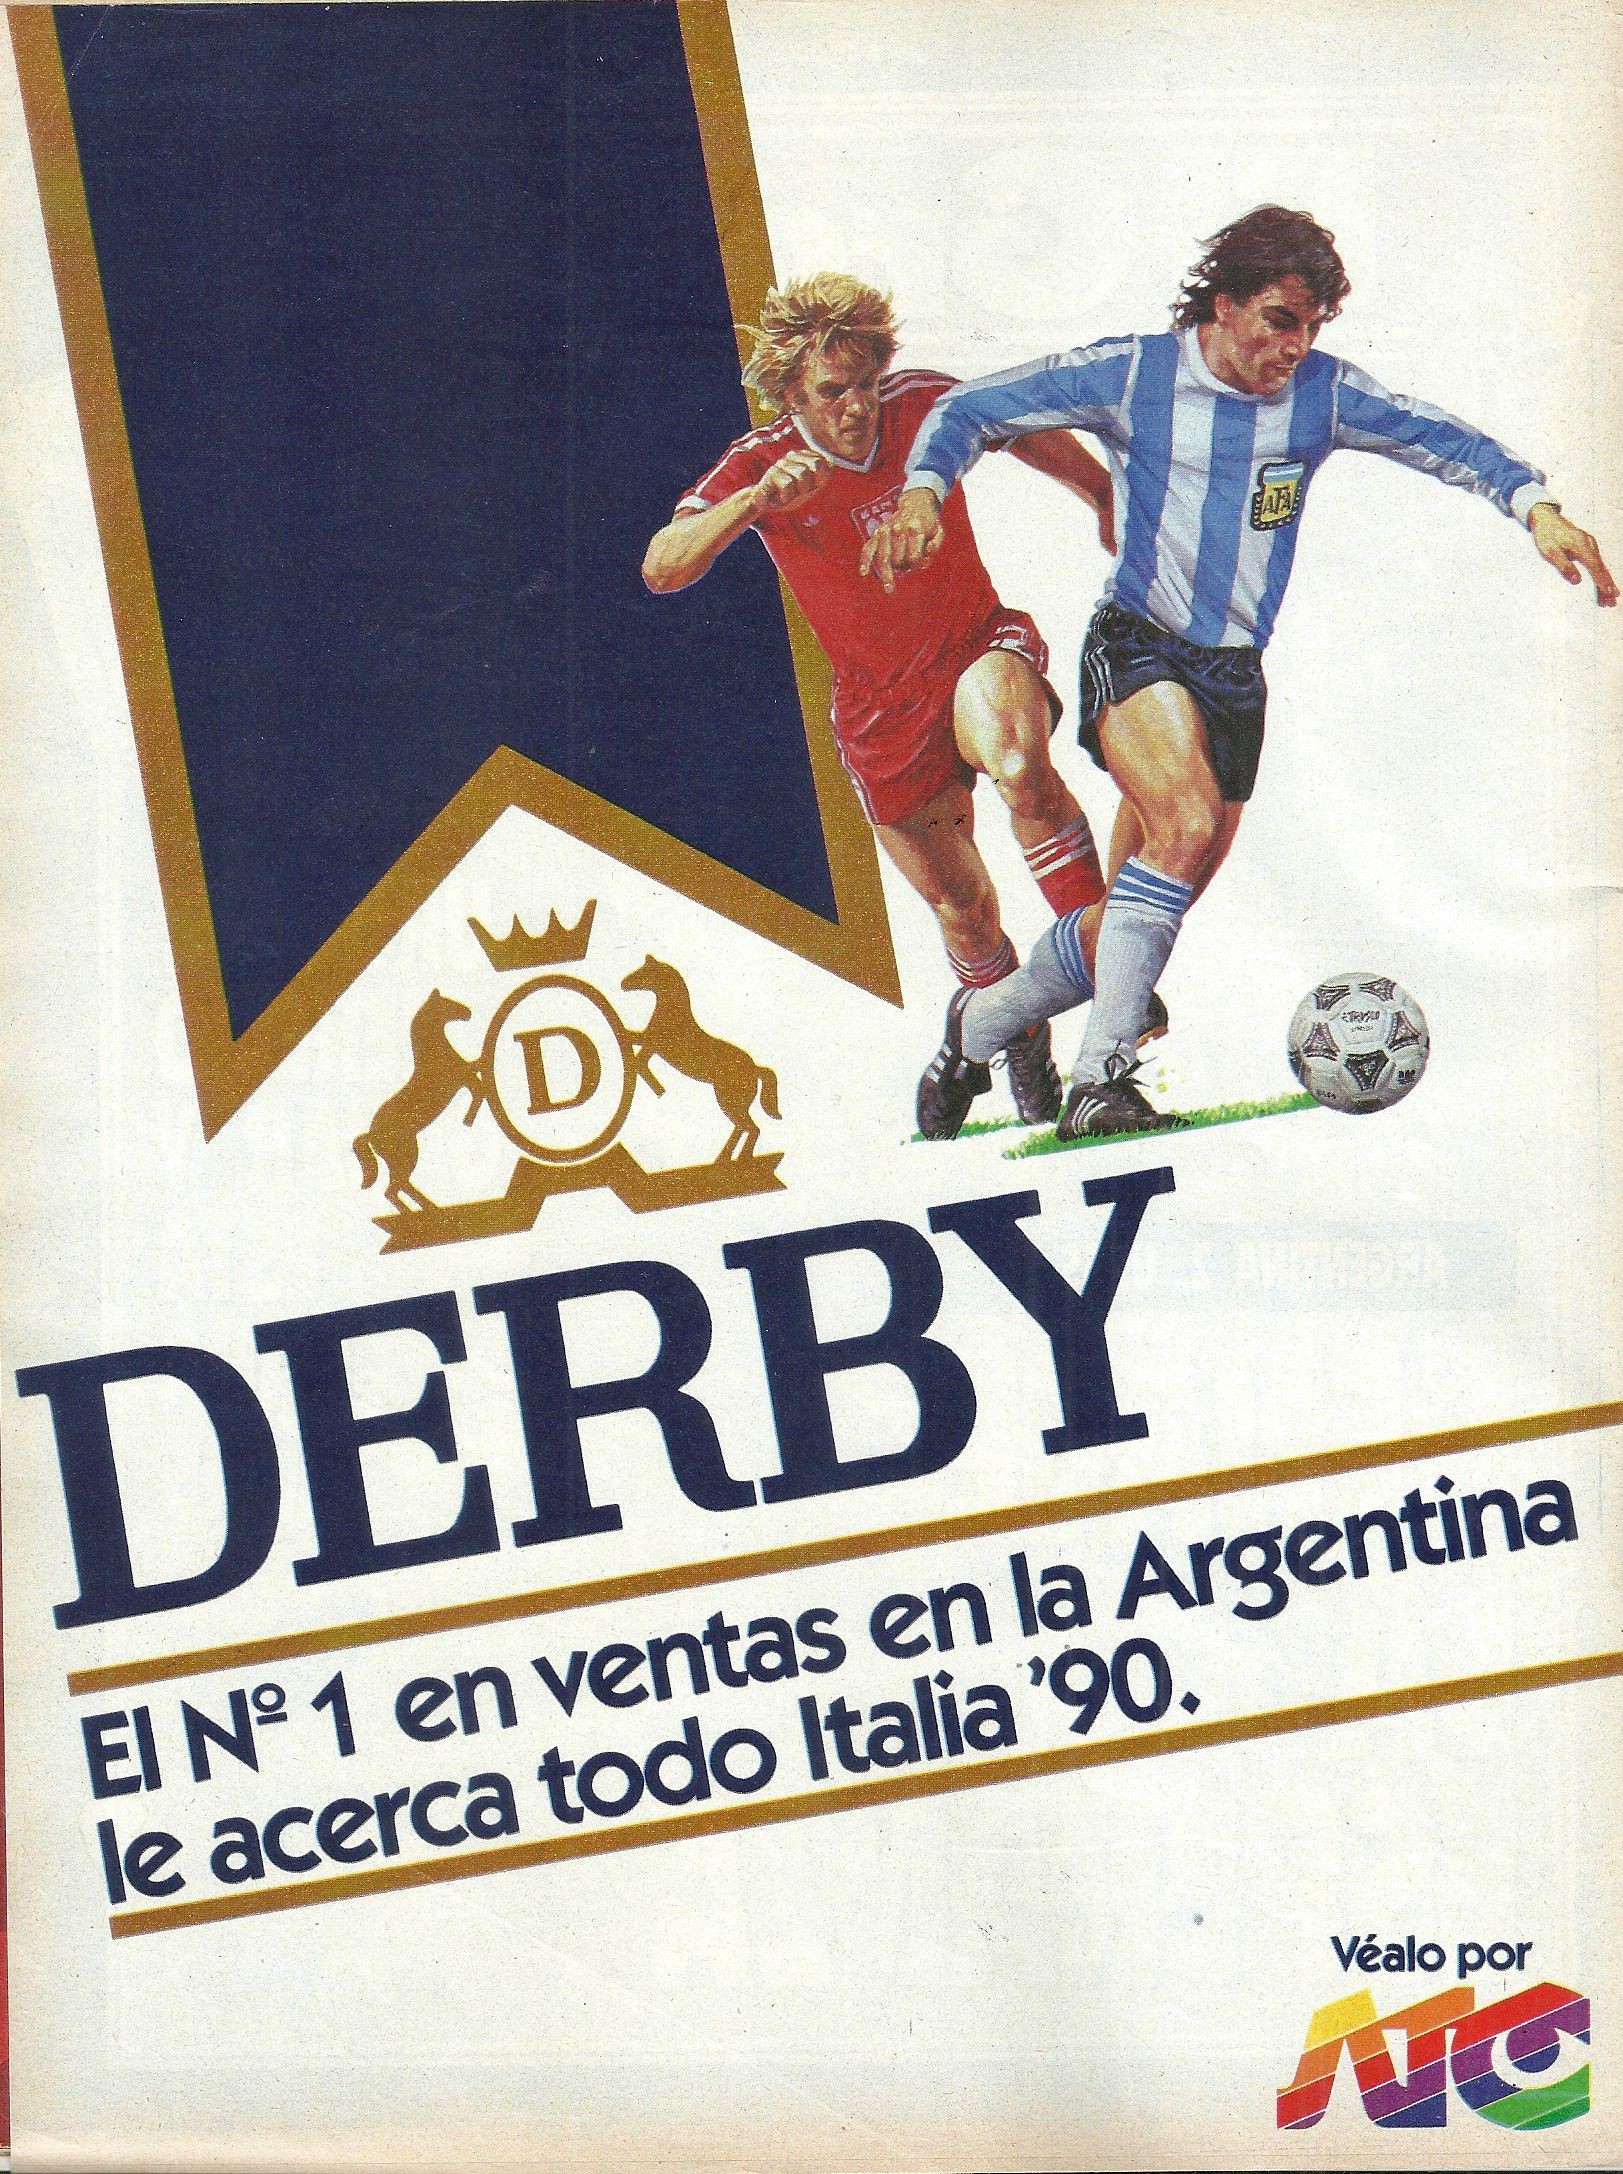 el momento en el que Argentina pasa a la final de Italia 90 en el estudio de ATC